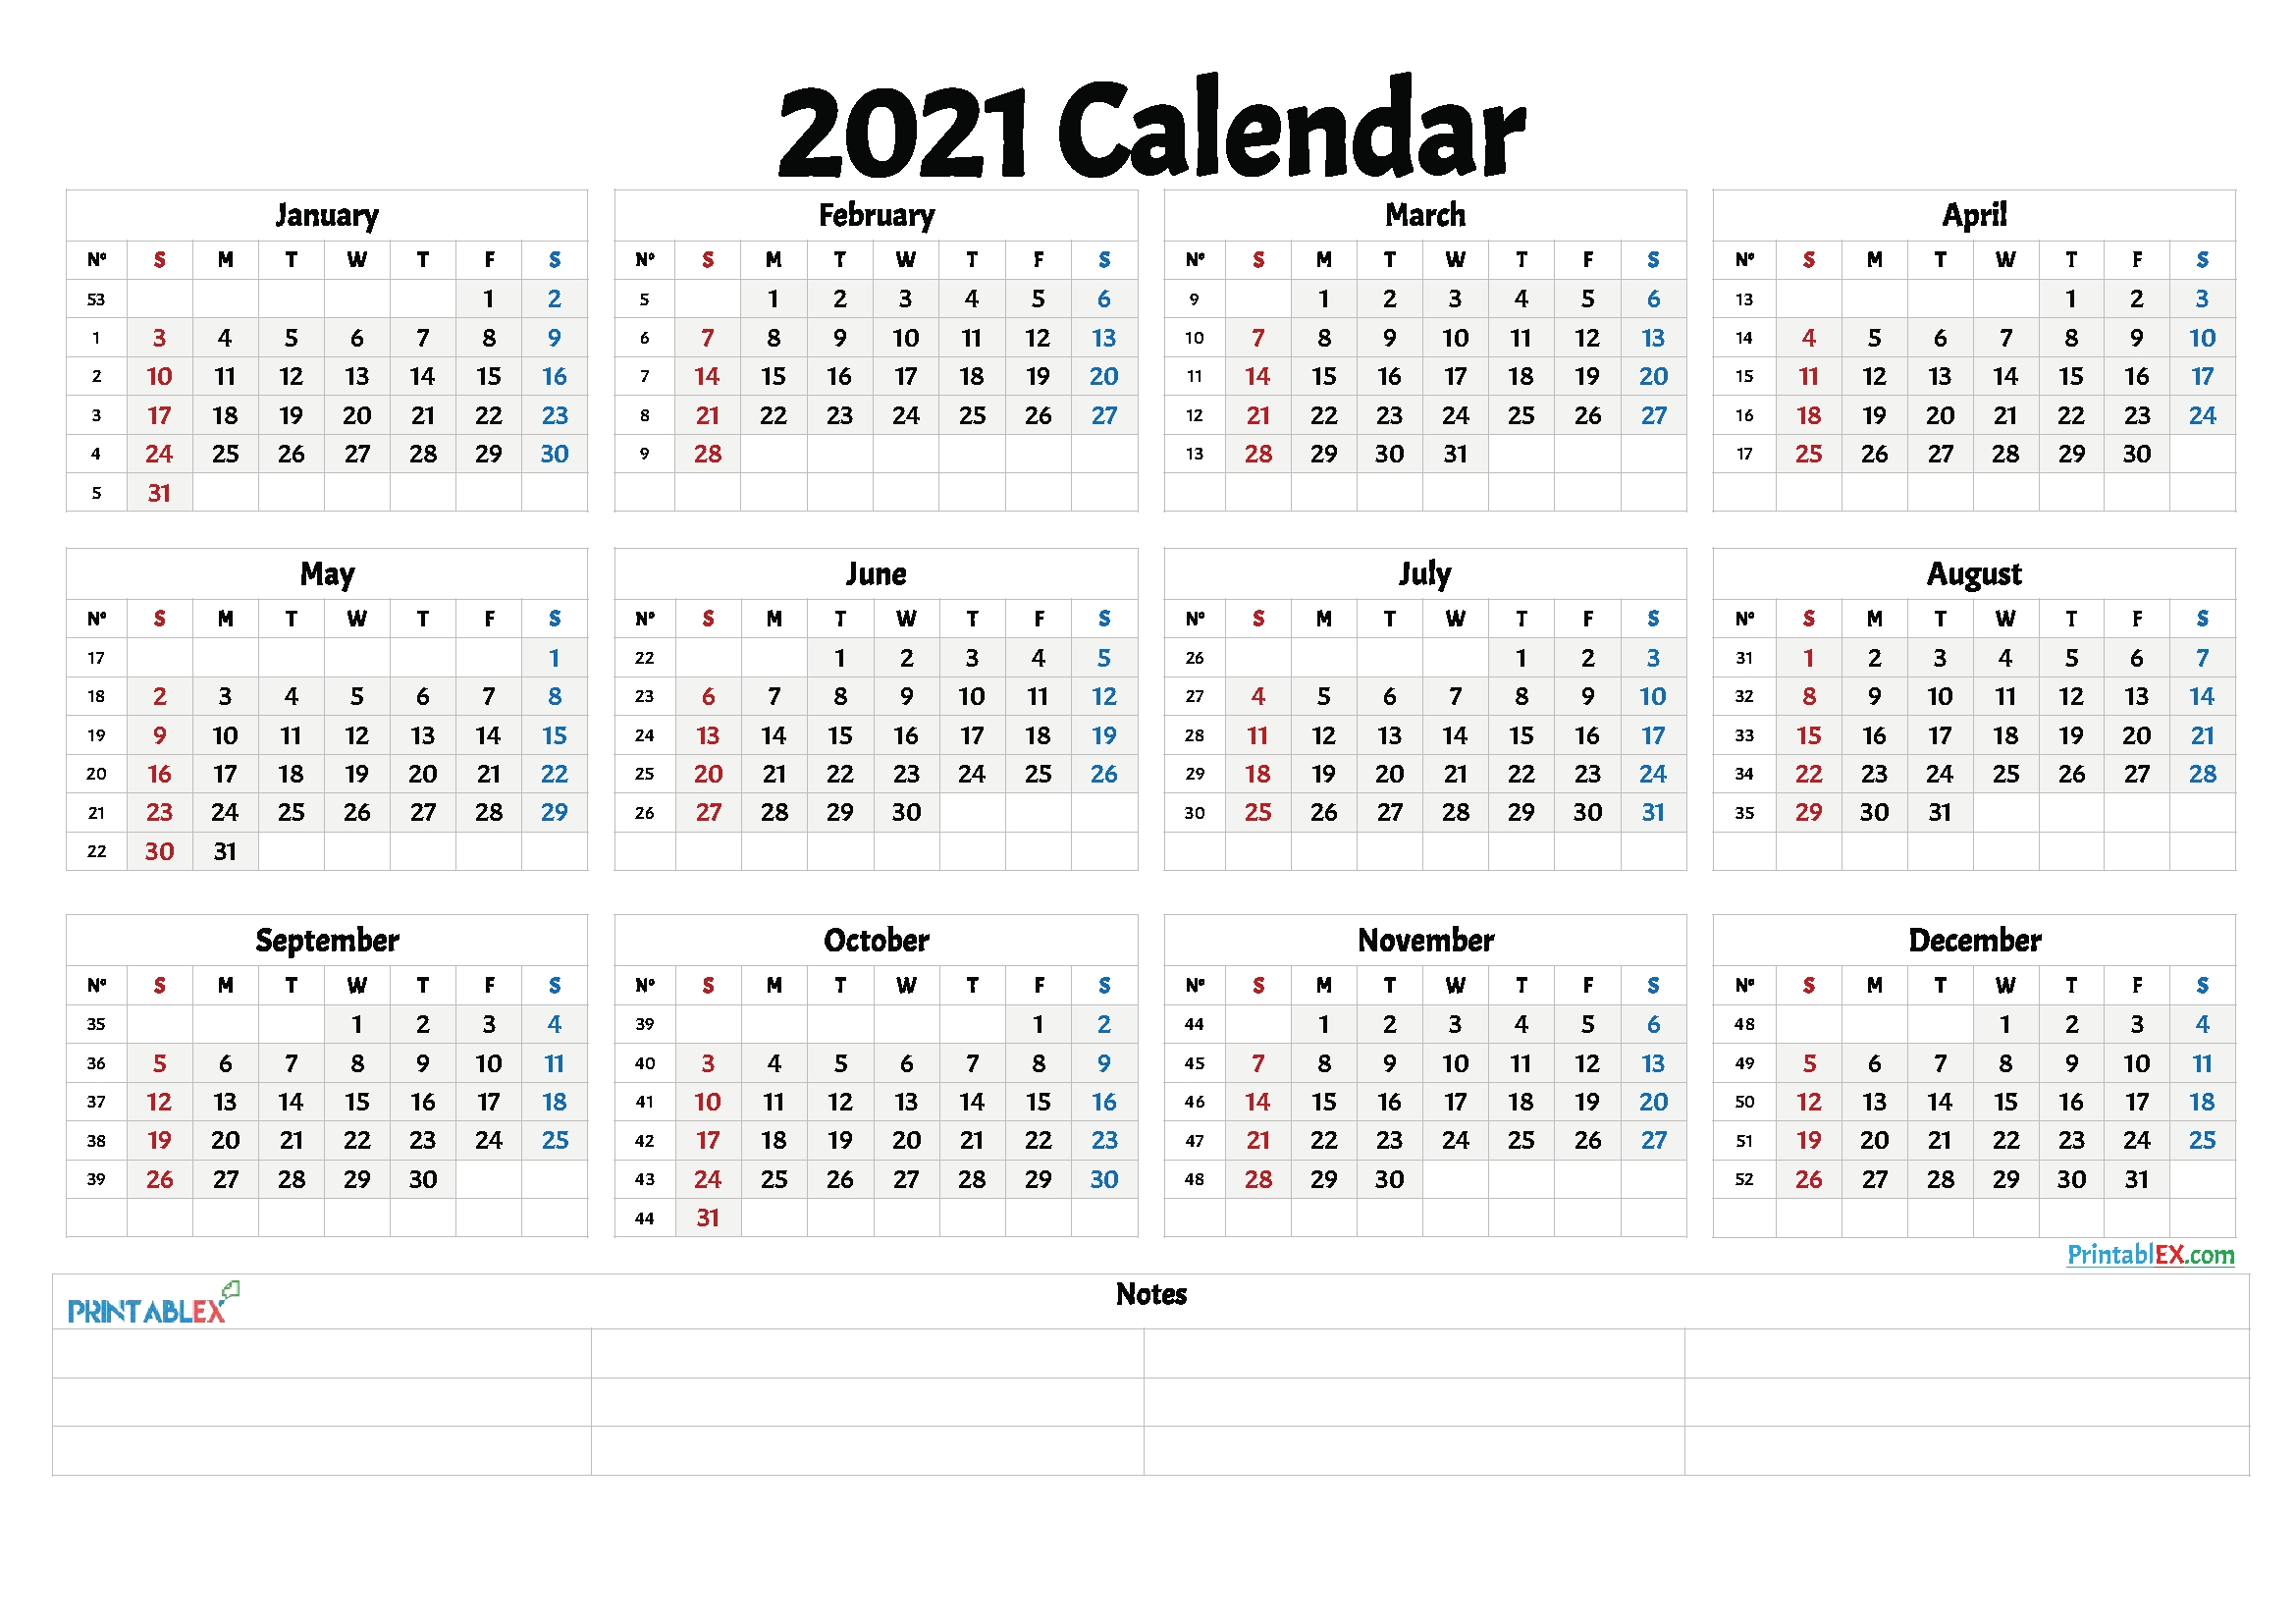 Free Printable 2021 Yearly Calendar With Week Numbers  Free Printable Bill Pay Calendar 2021